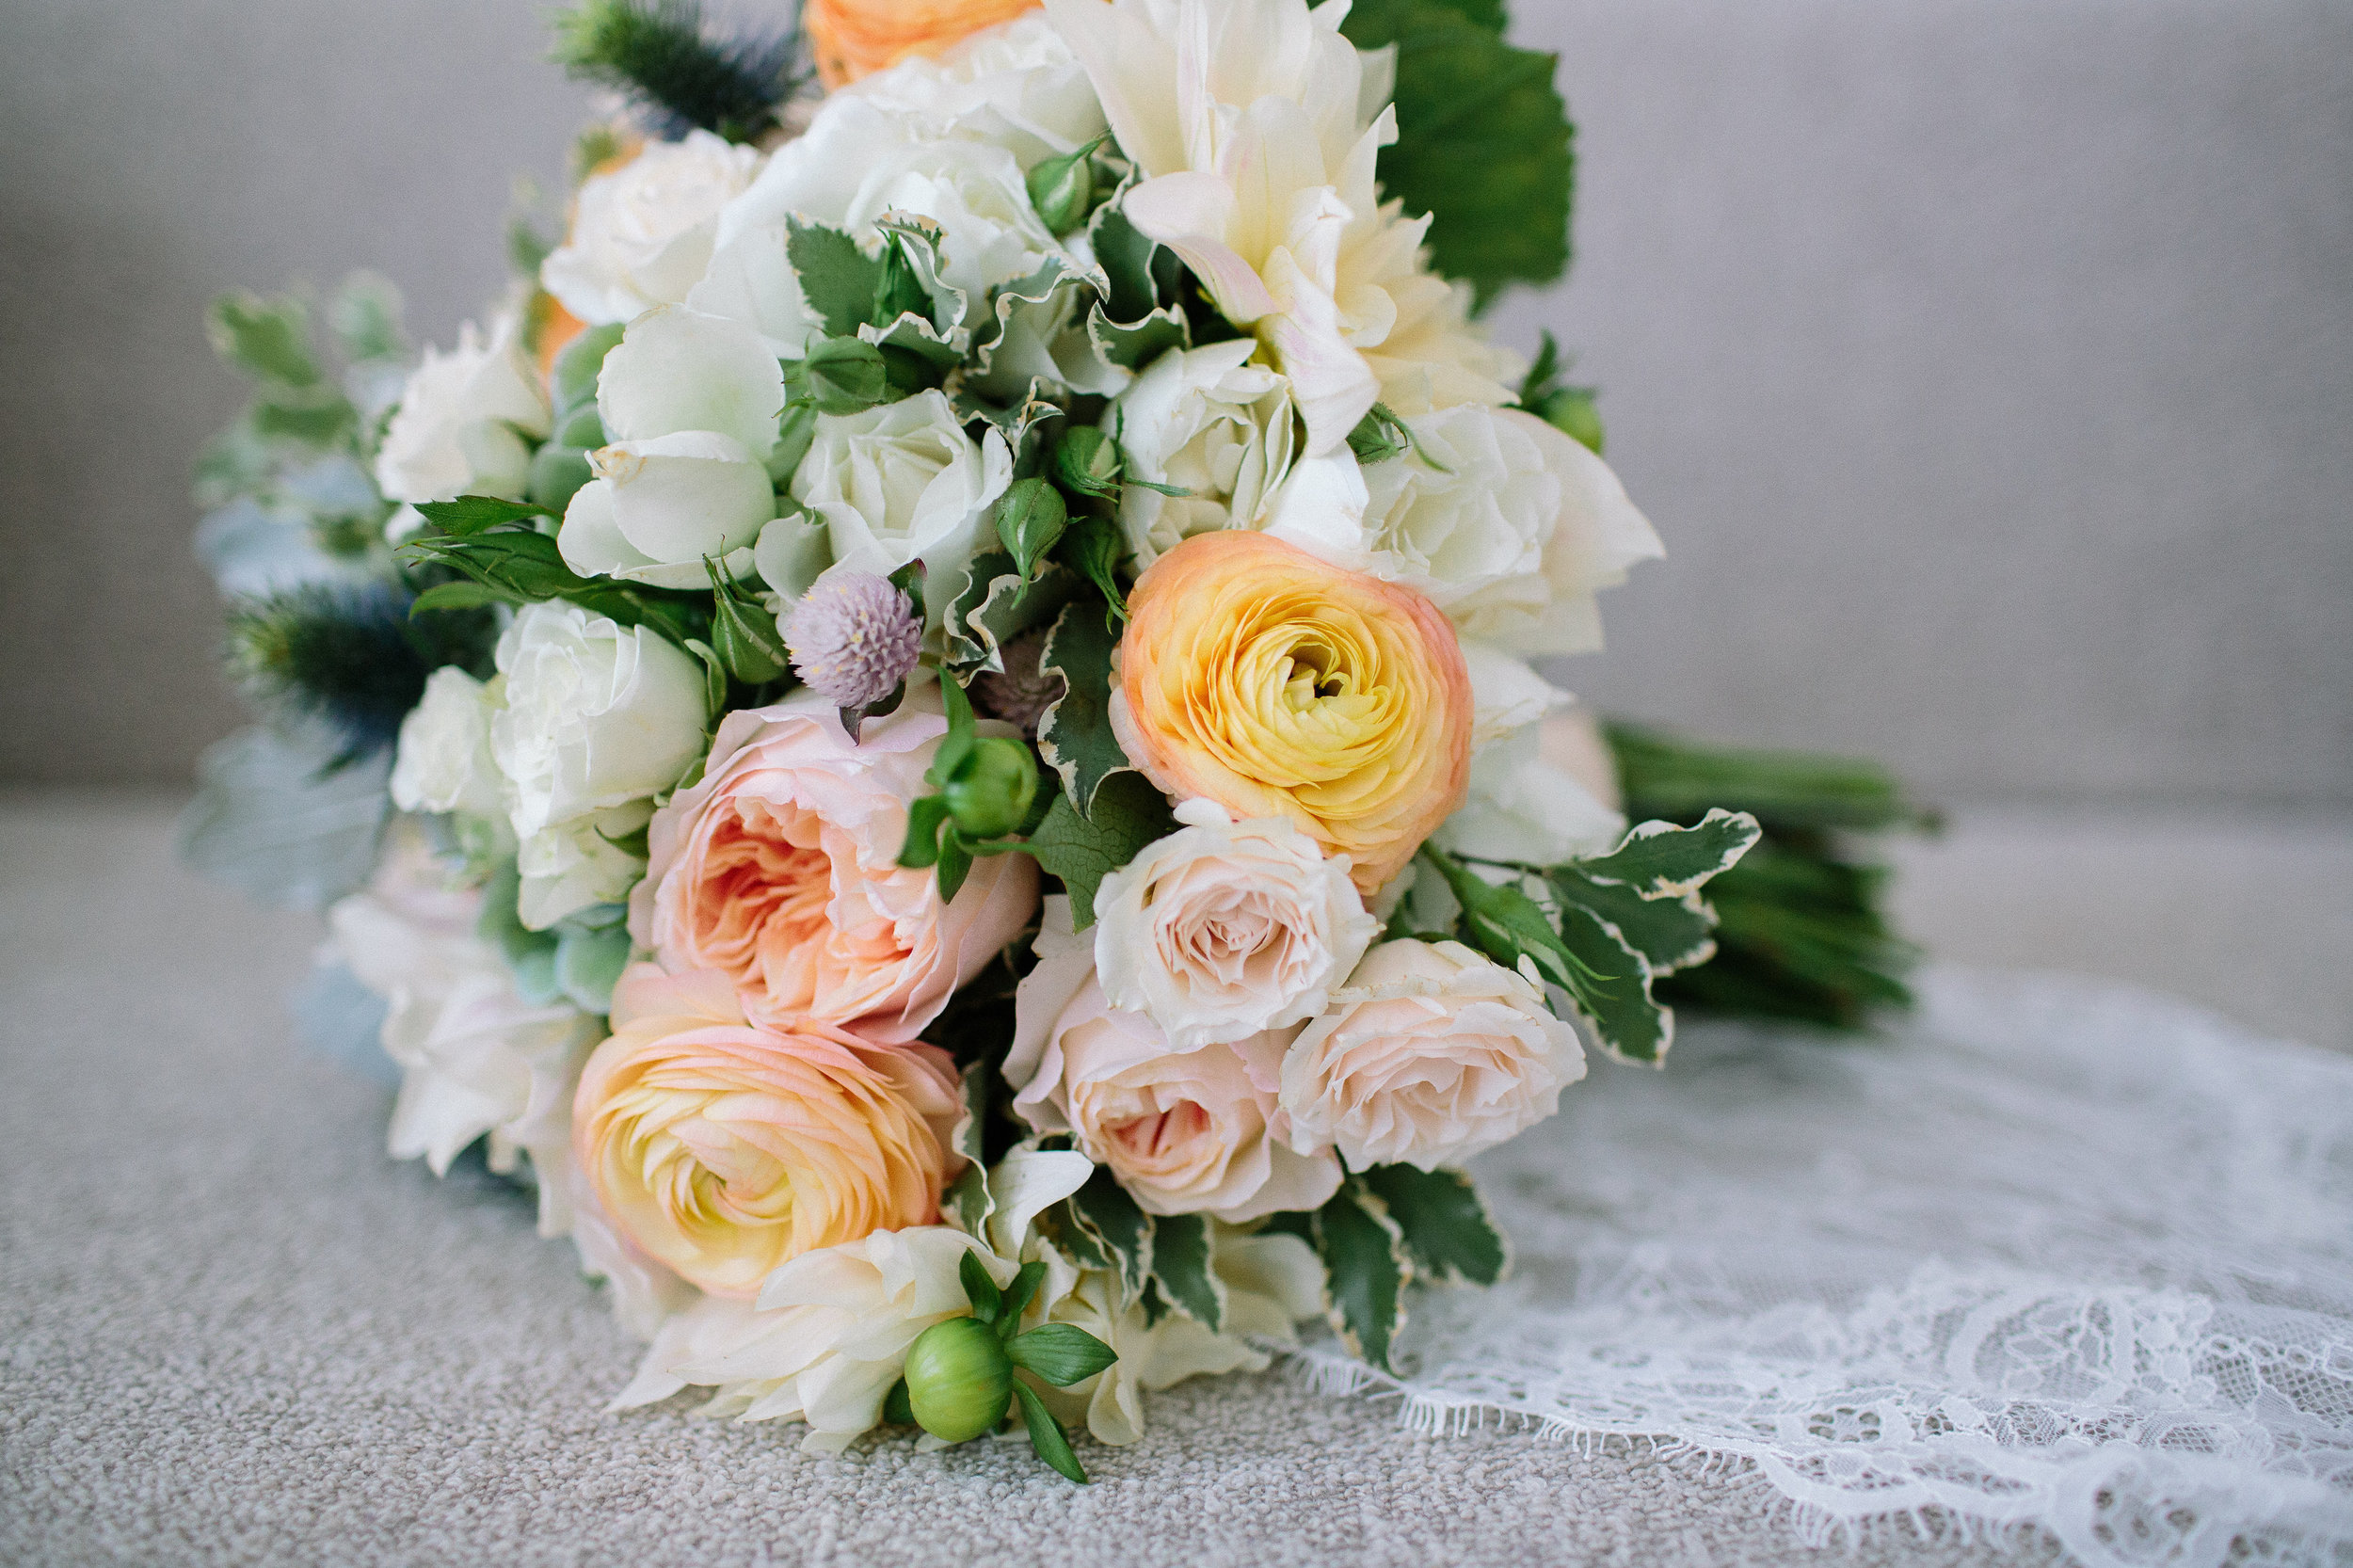 Juliet roses and ranunculus bouquet